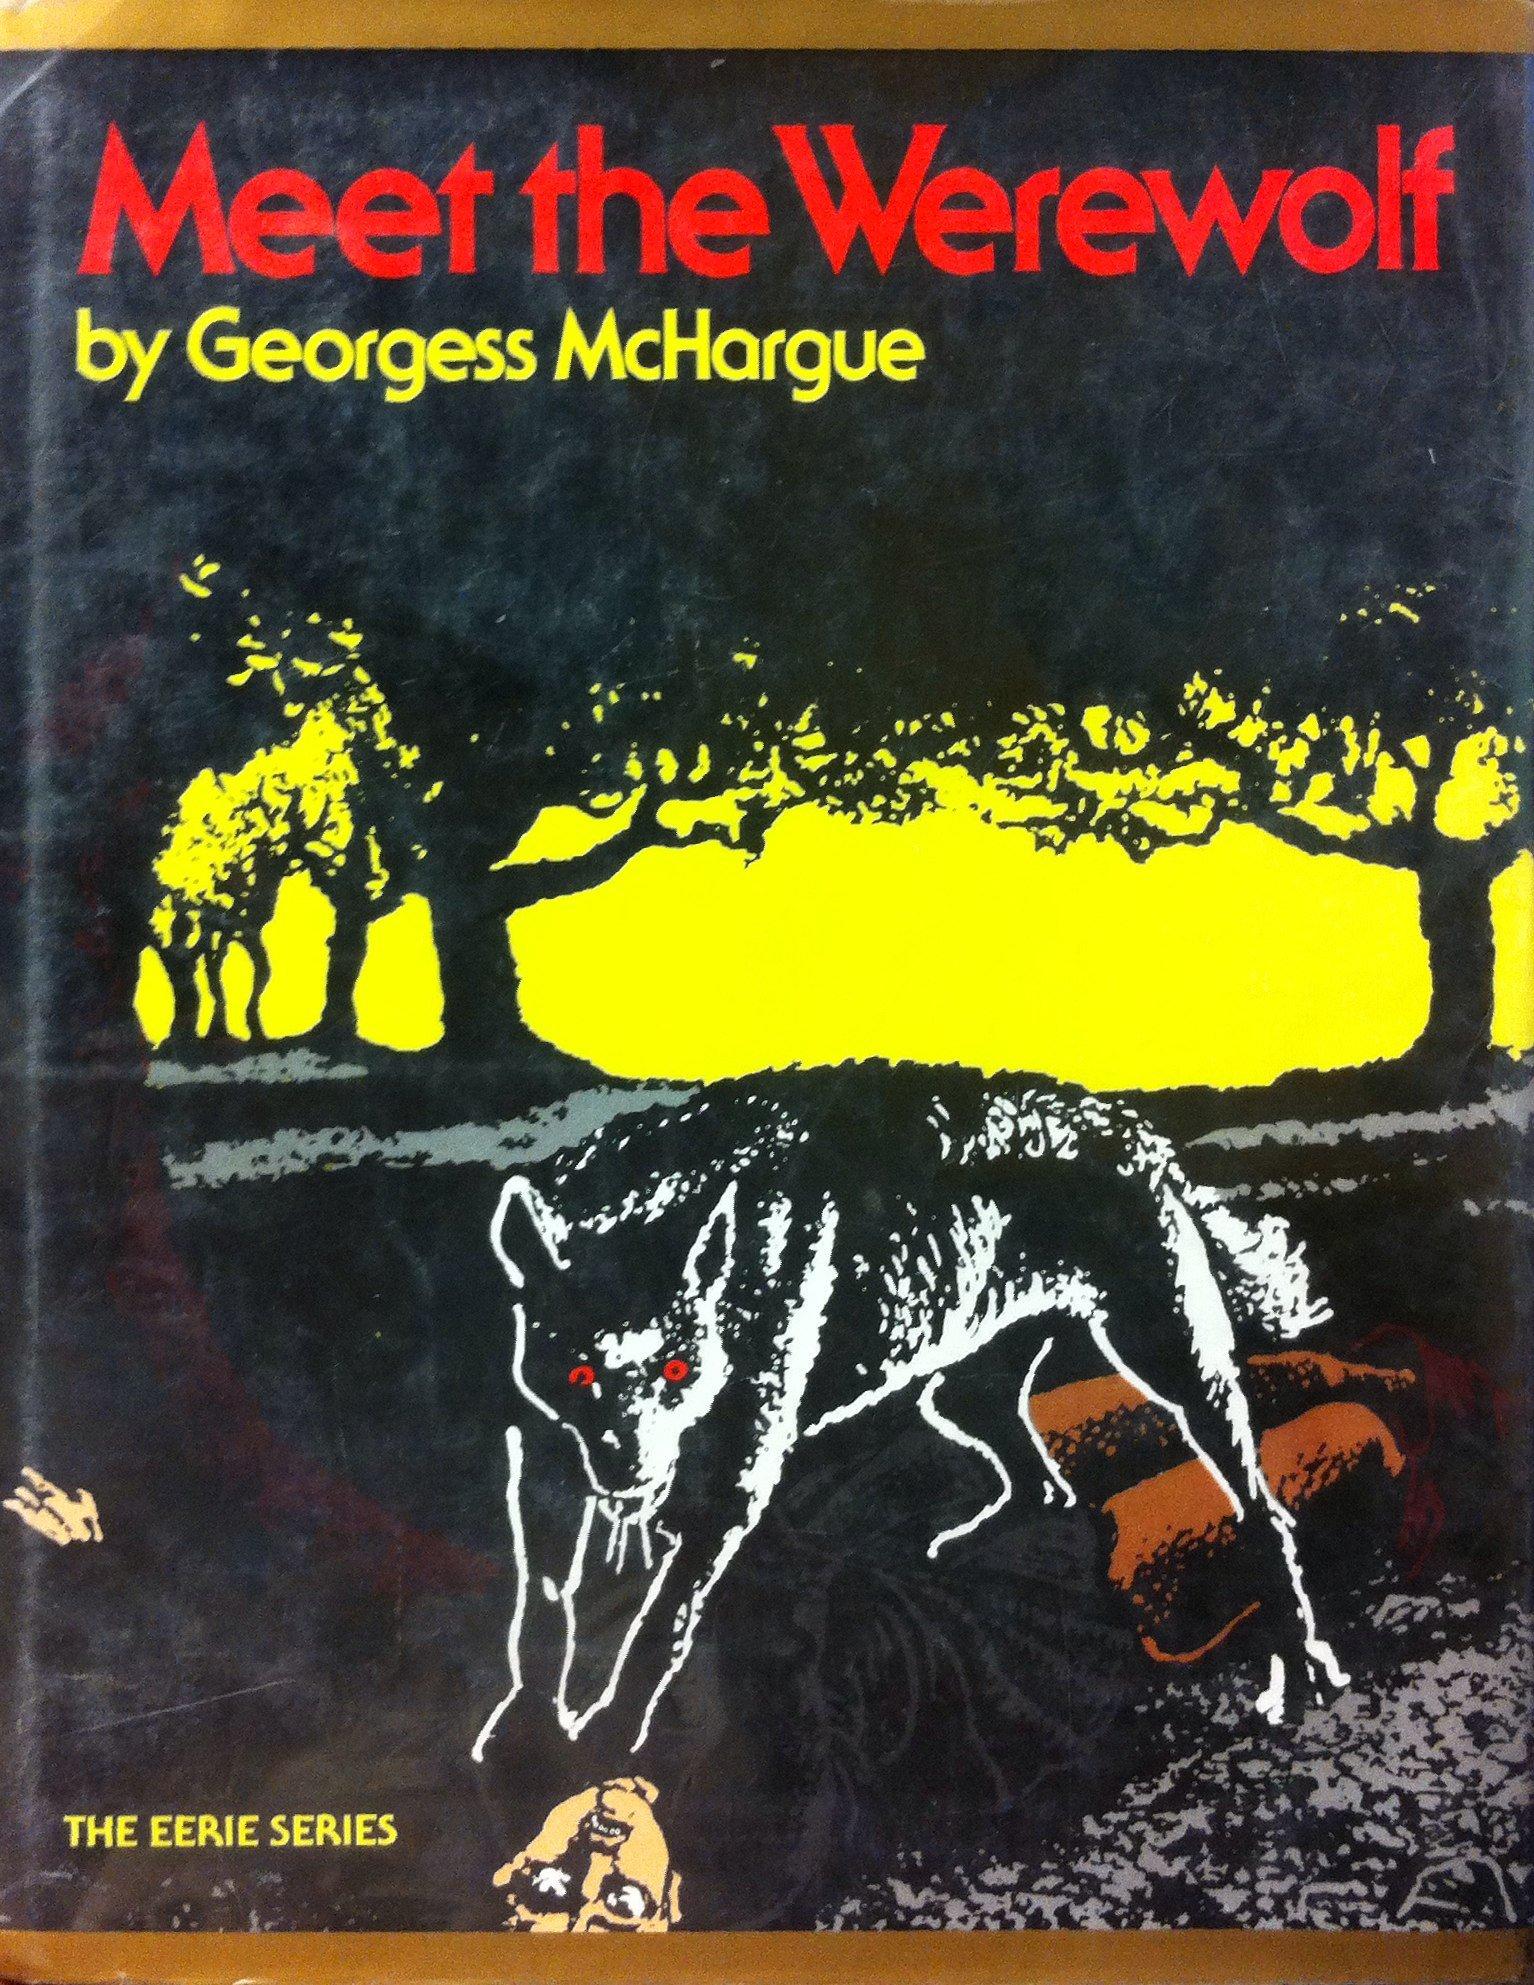 Meet the Werewolf (The Eerie Series): Georgess McHargue